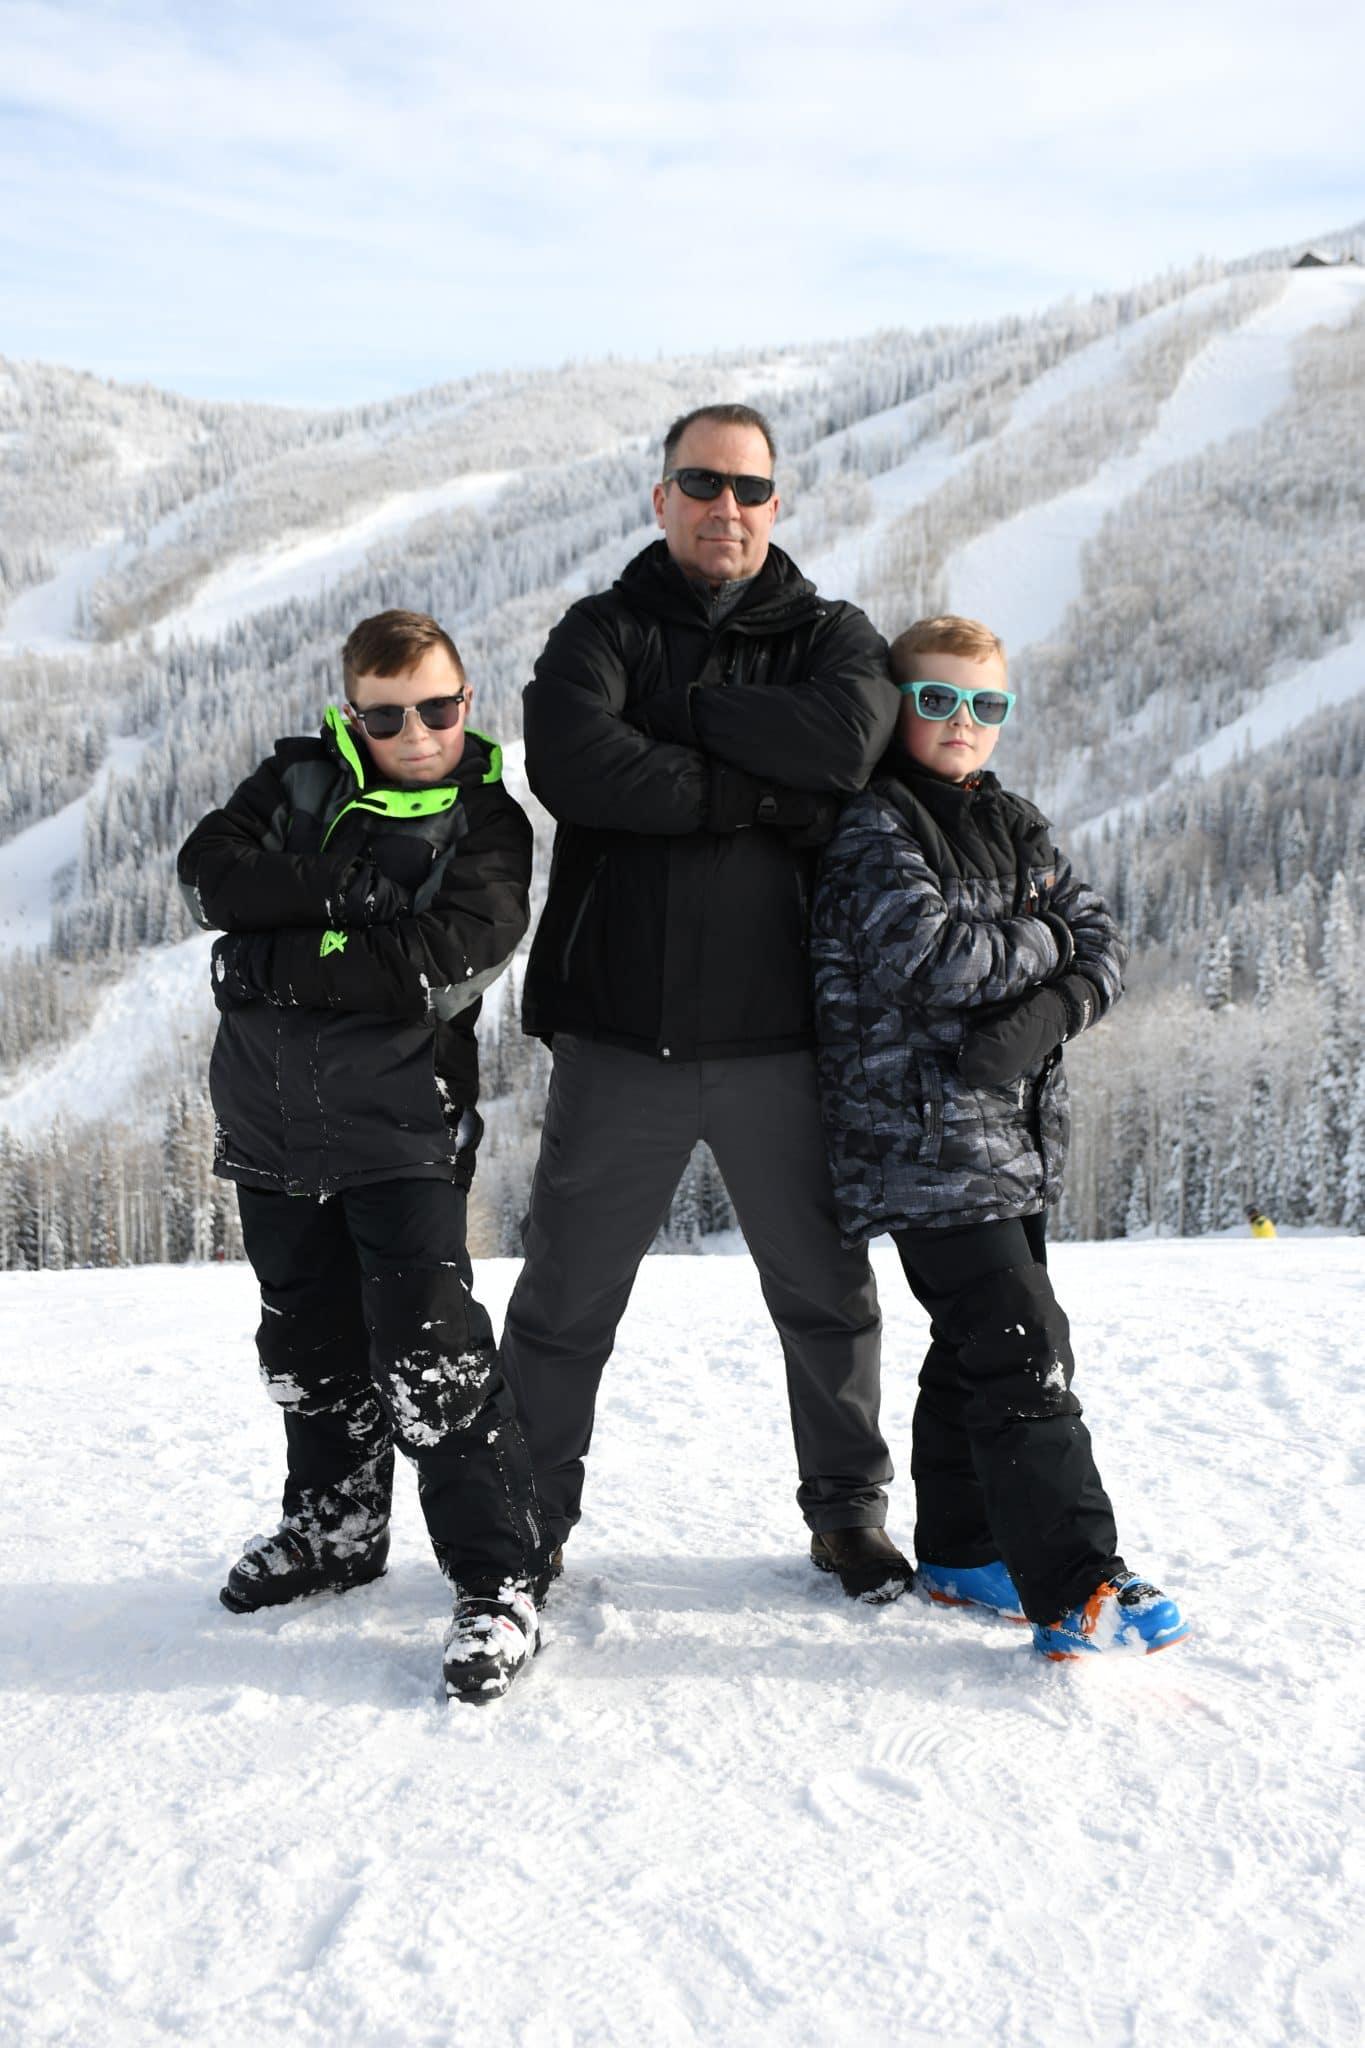 11Jim Salkowski and sons on snowy mountain